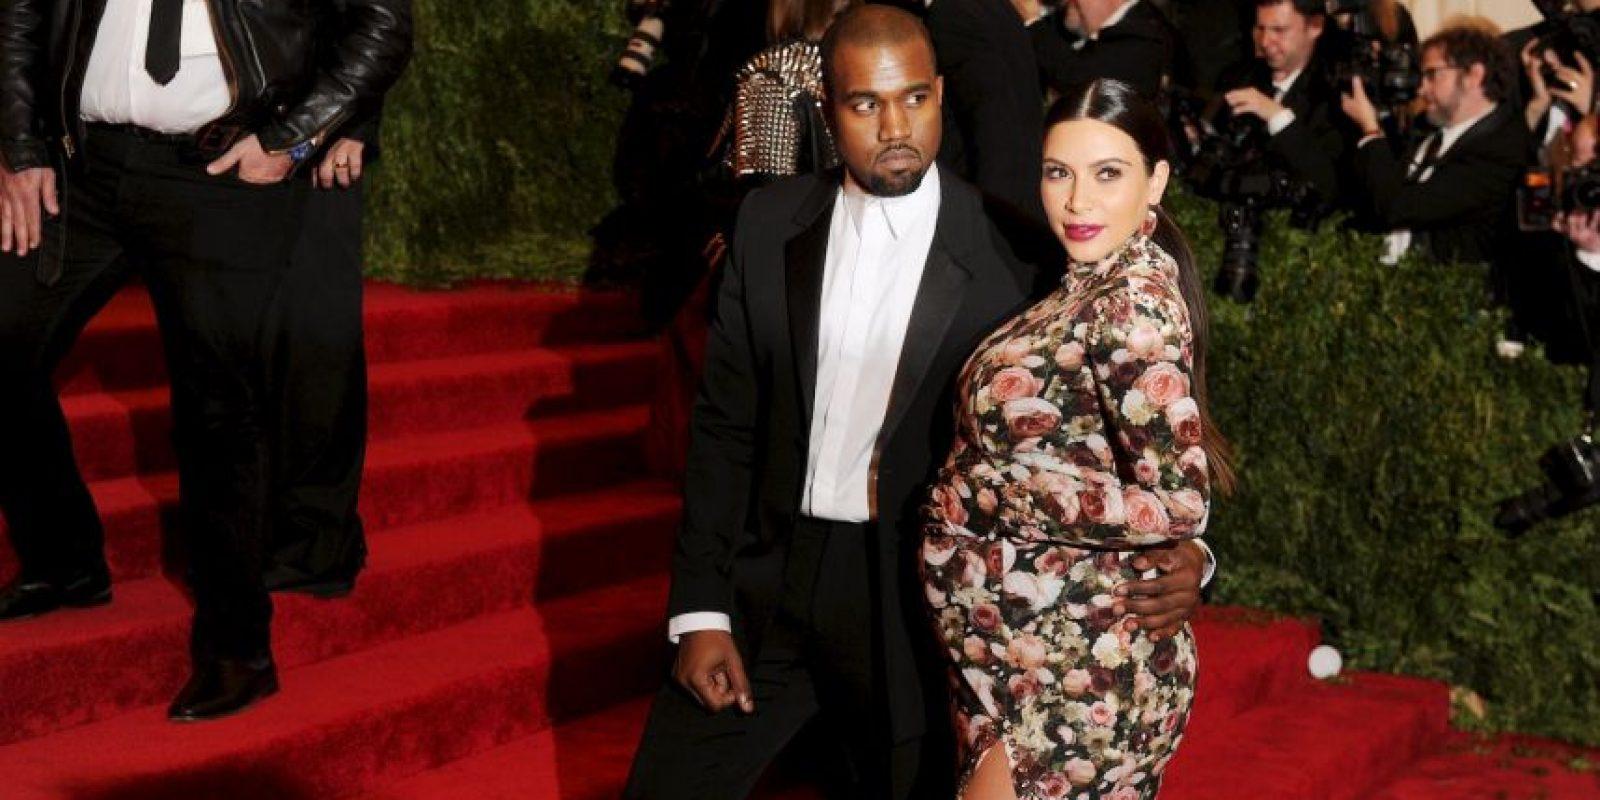 Buscan otro bebé Foto:Getty Images